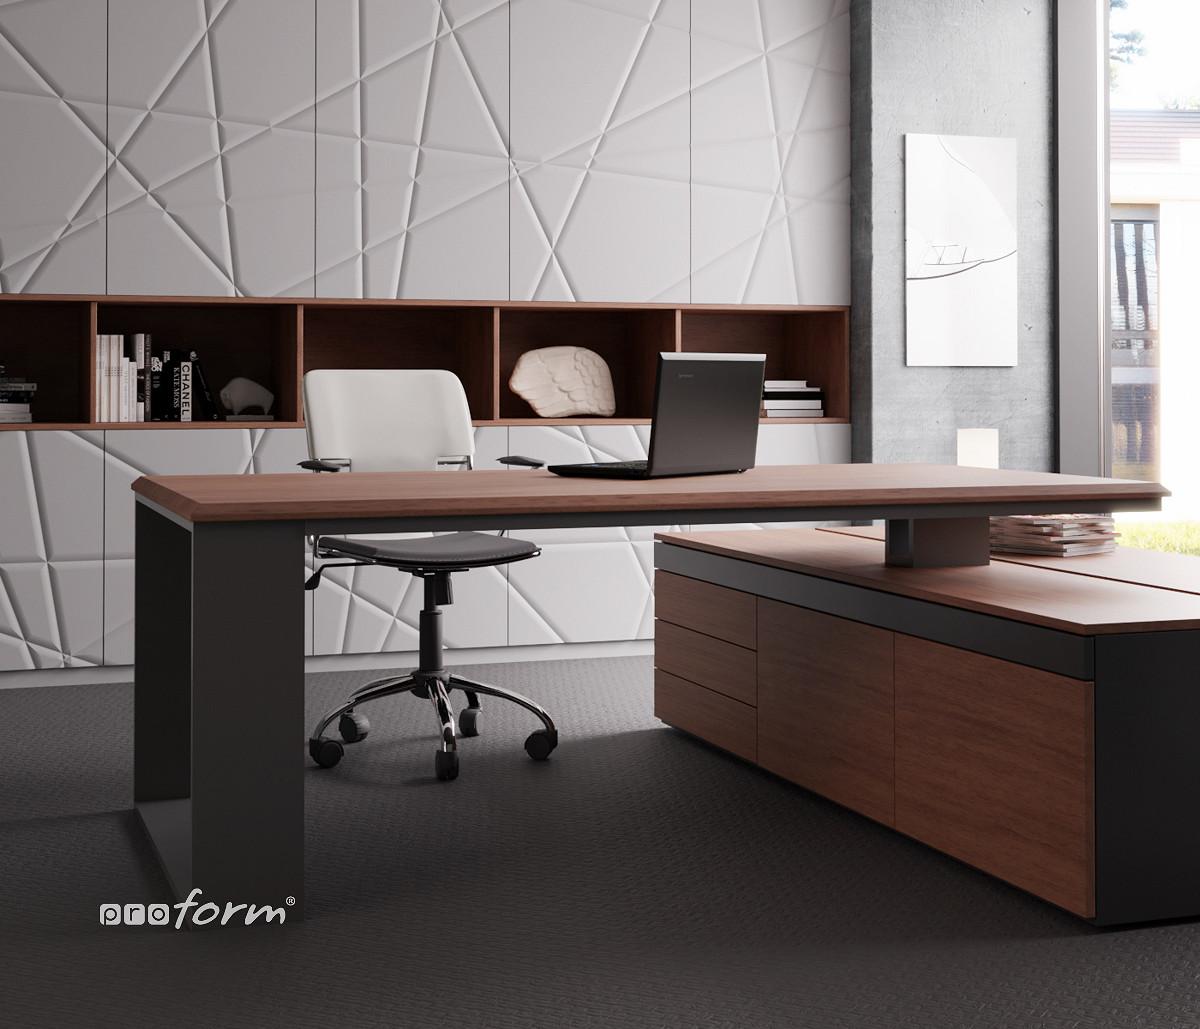 Panele dekoracyjne moduloform do biura.jpg [597.13 KB]